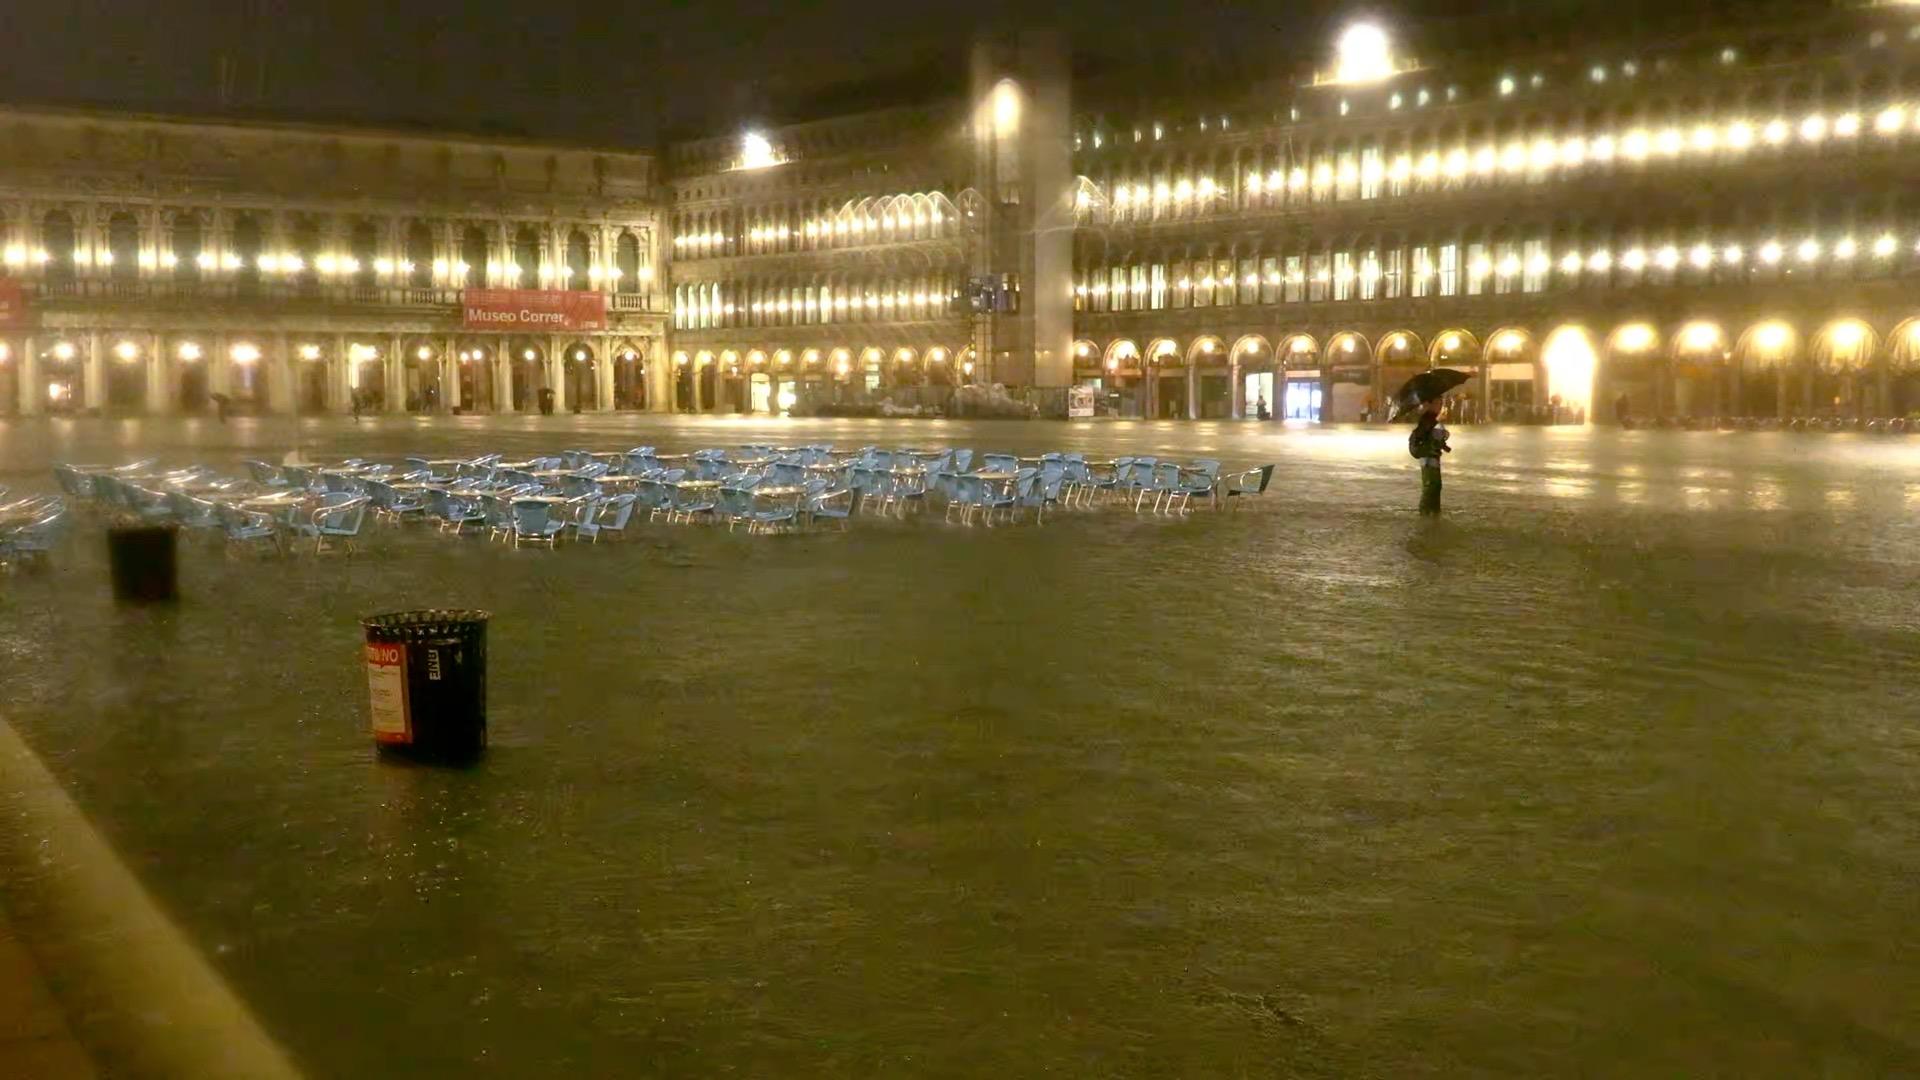 Венеция оказалась под водой из-за рекордного паводка (ФОТО, ВИДЕО)  - фото 4